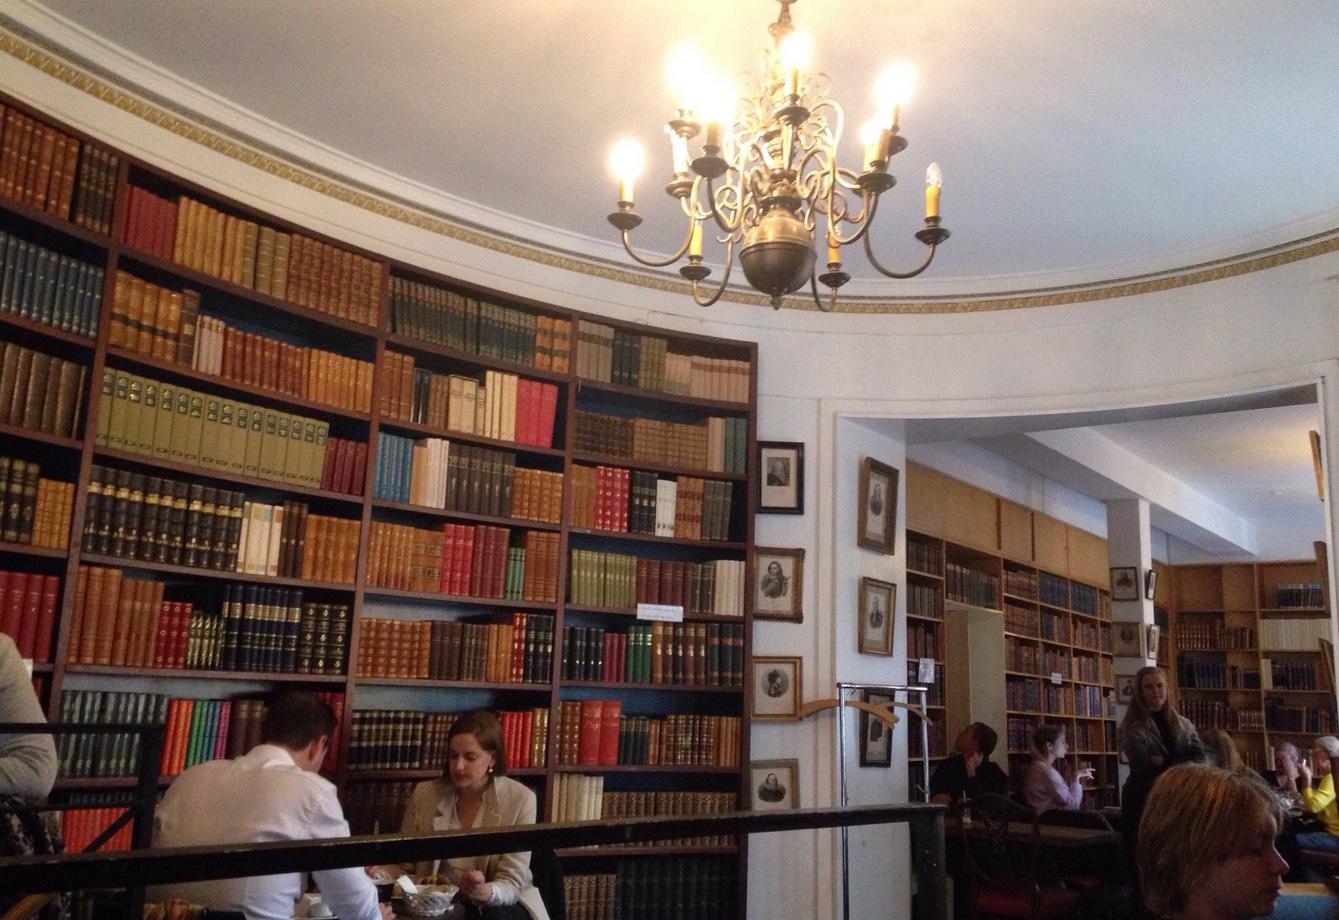 Ресторан-библиотека Paludan